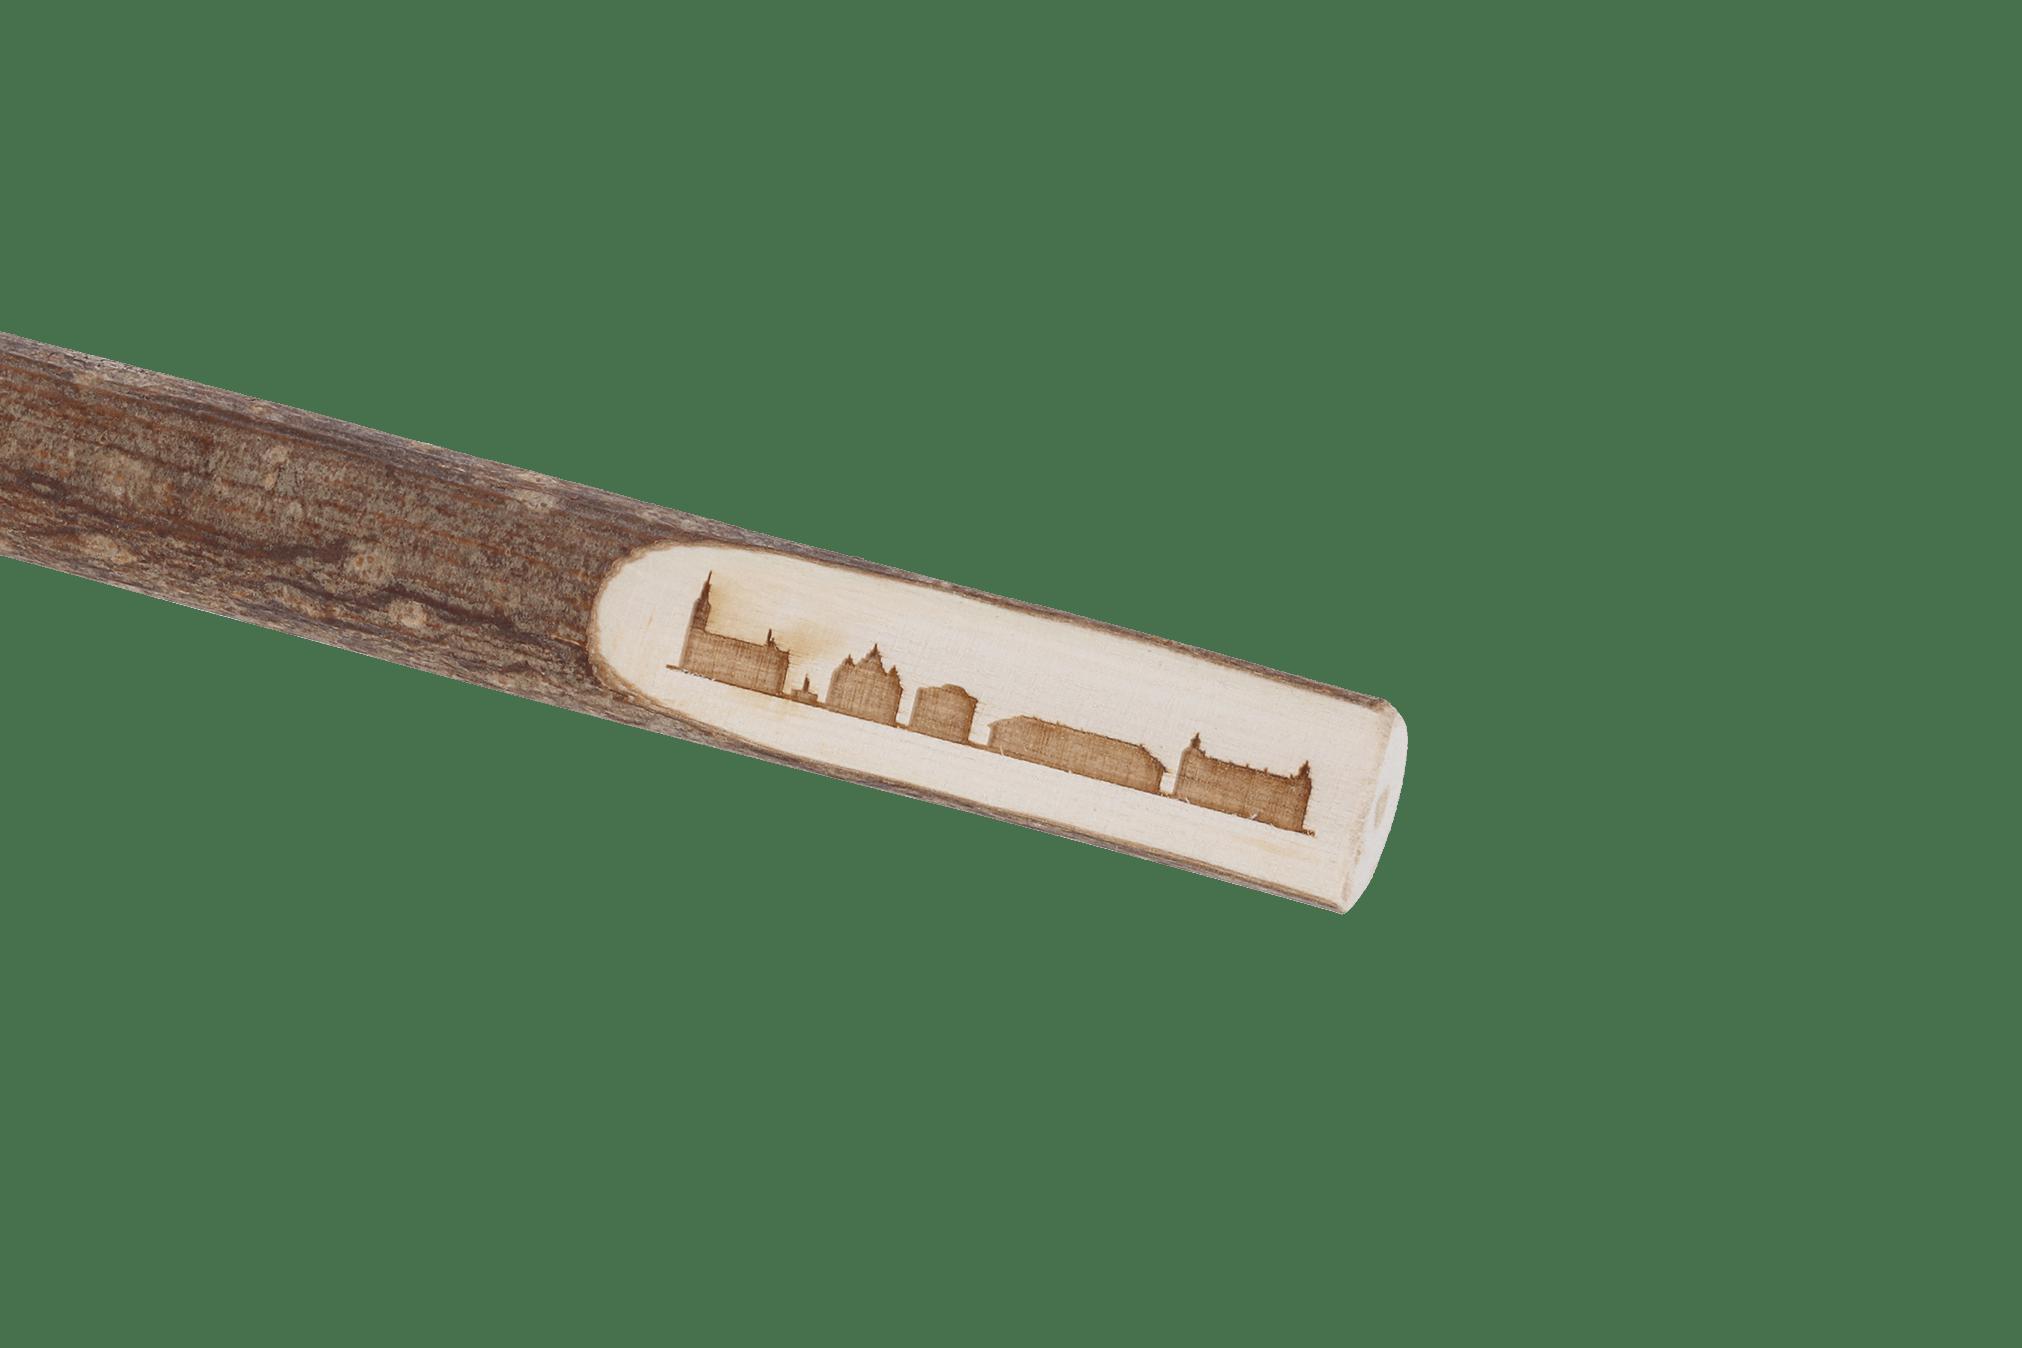 Kugelschreiber Skyline Holz